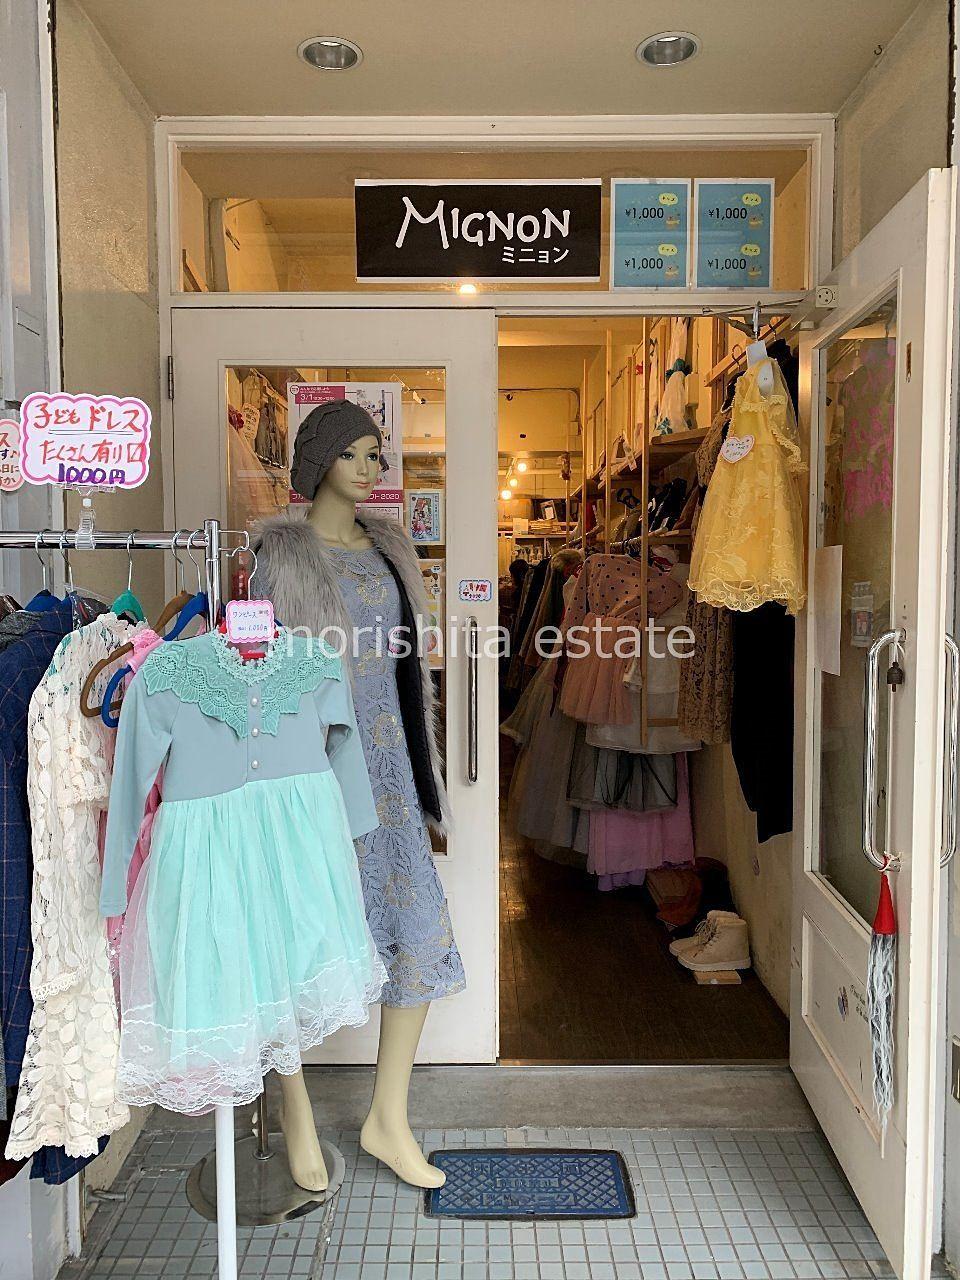 MIGNON~ミニョン~